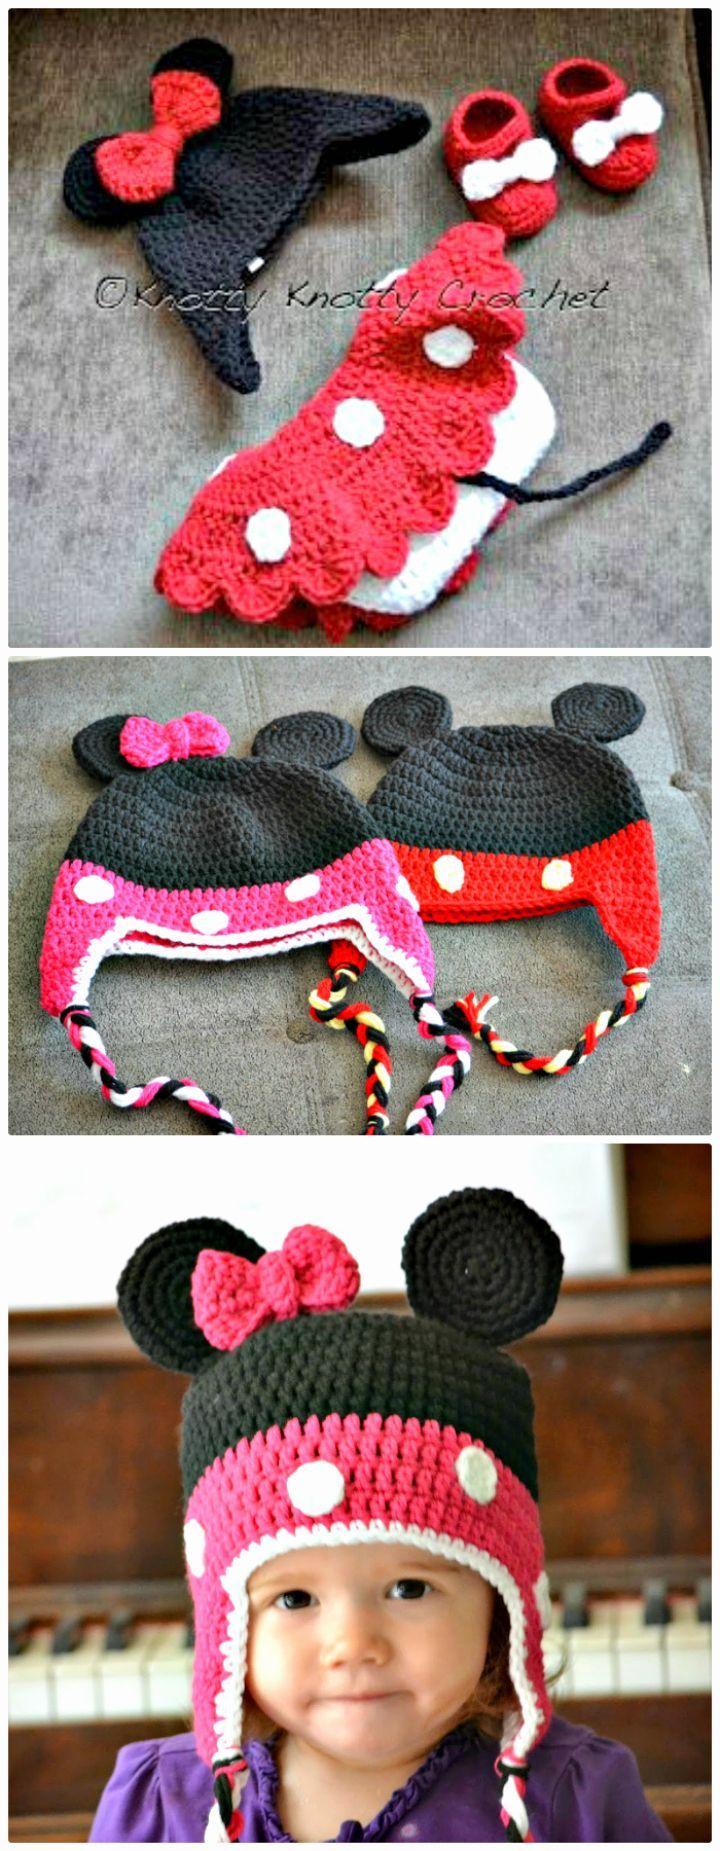 Crochet Mickey Mouse Patterns, Hat, Amigurumi | Crochet